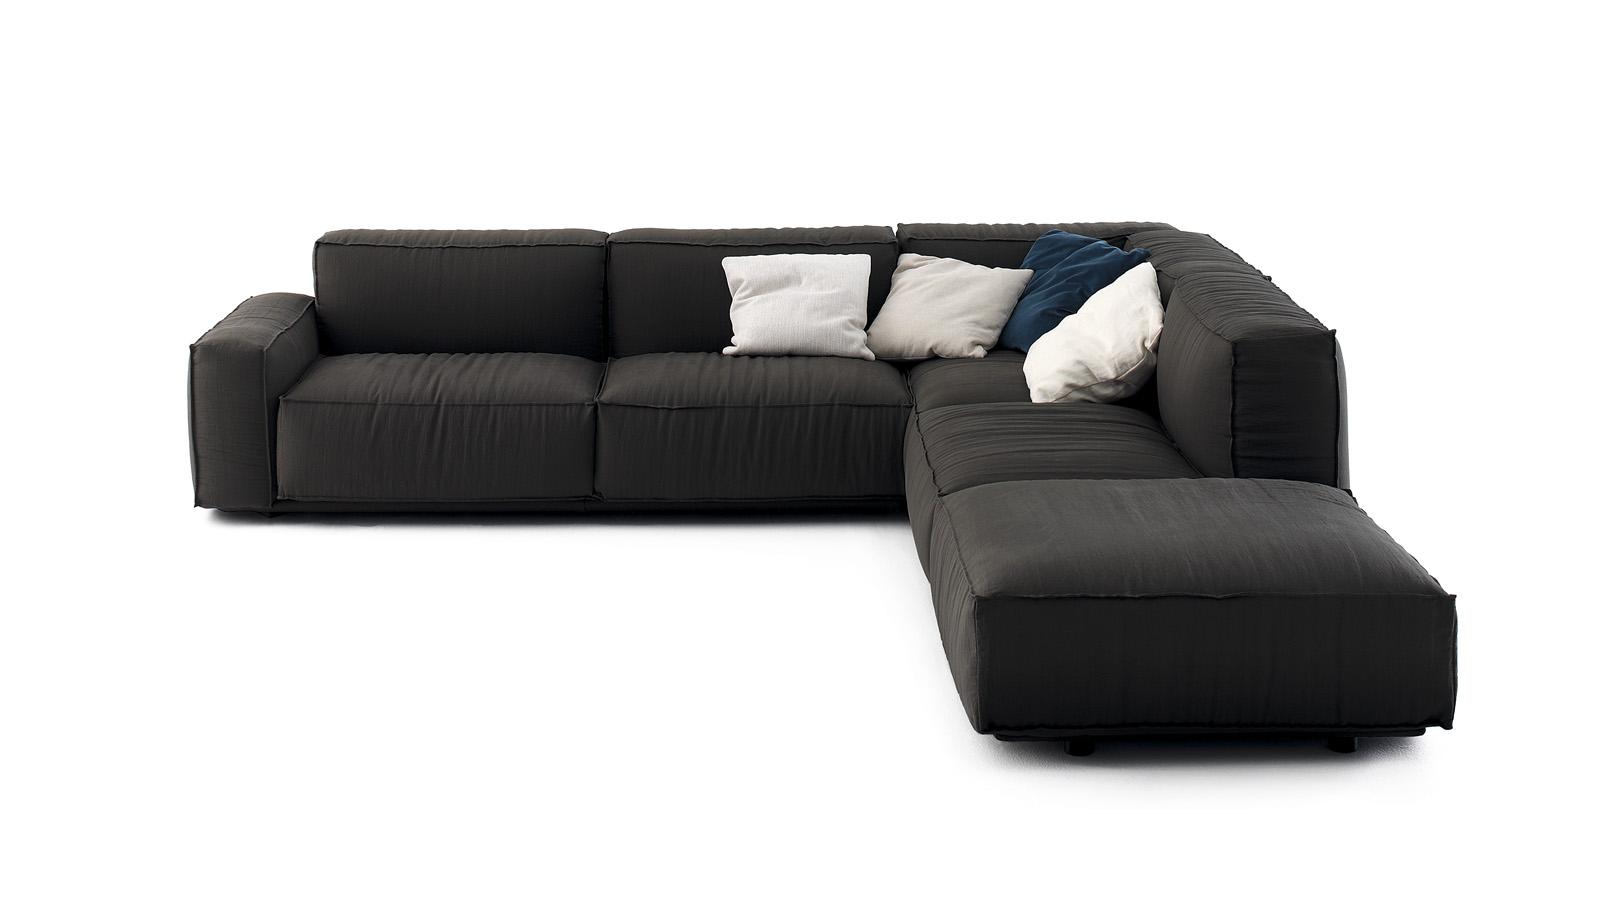 TinnappelMetz-arflex-Marechiaro-sofa-10